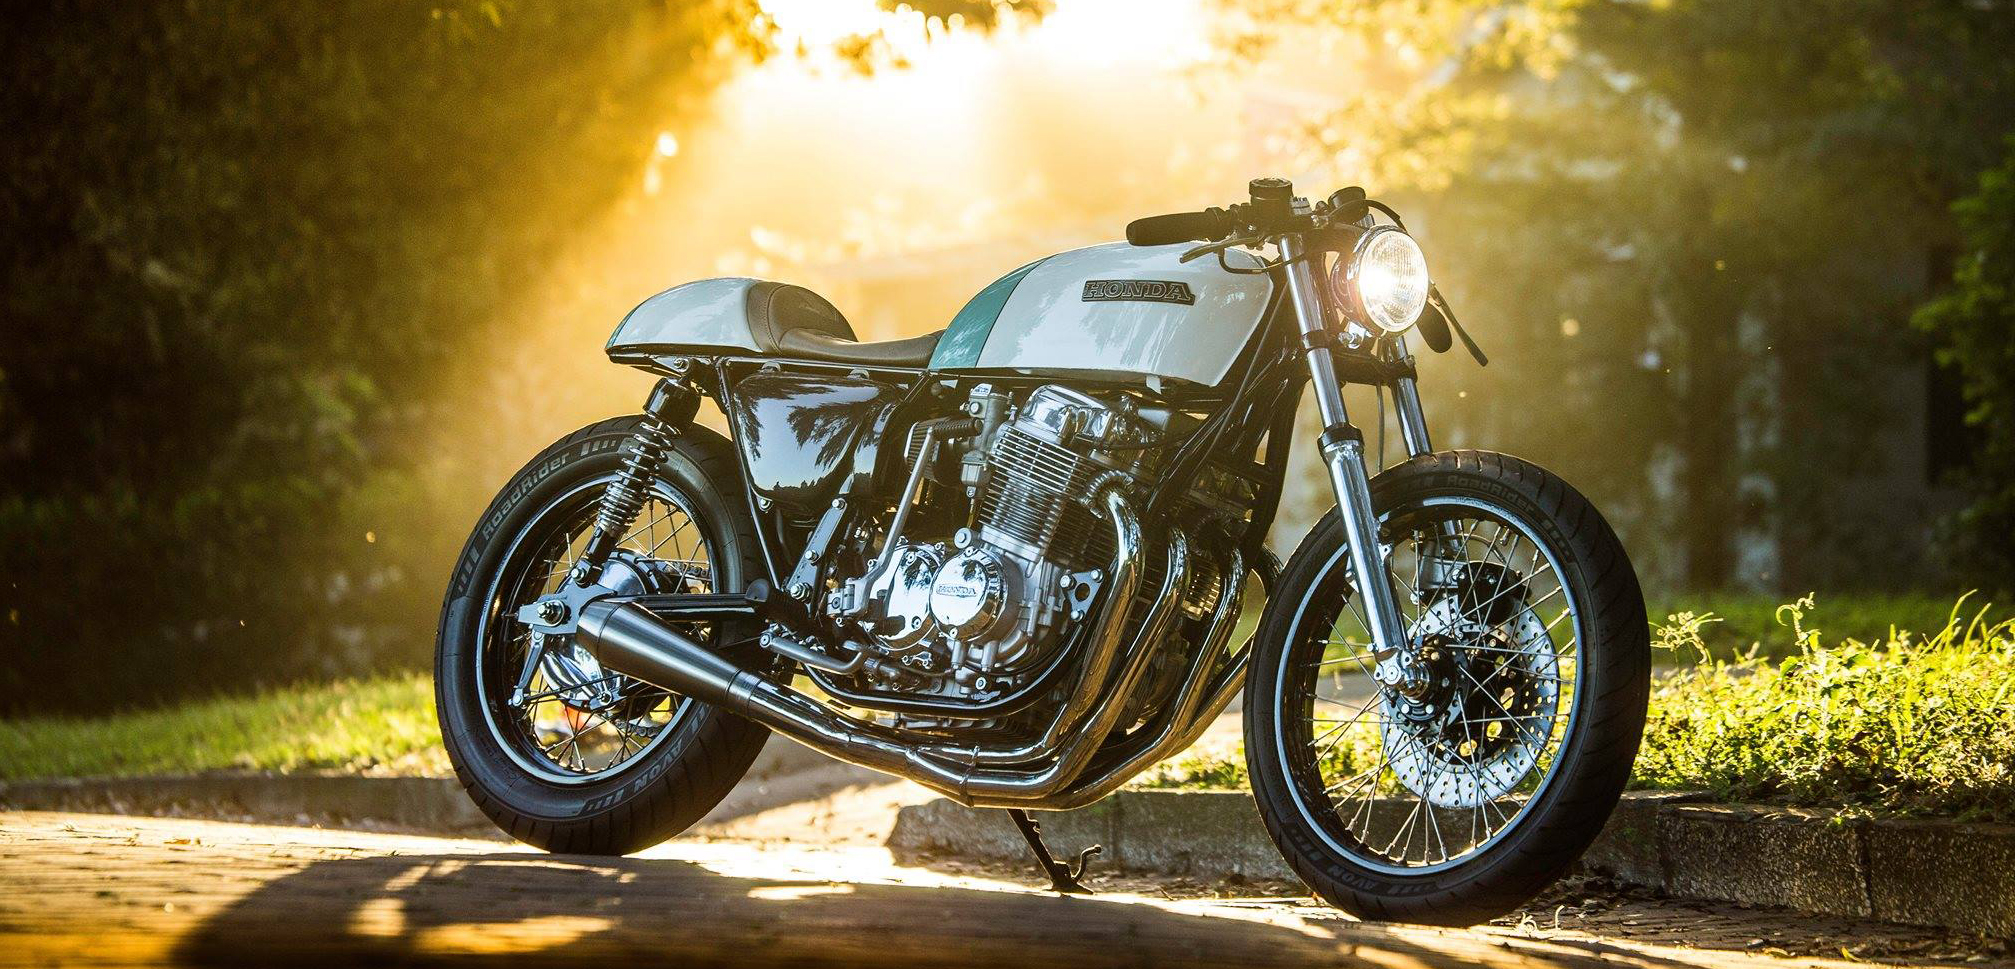 Lithium ion friendly Rectifier/Regulator for Vintage Bikes! – Rick's